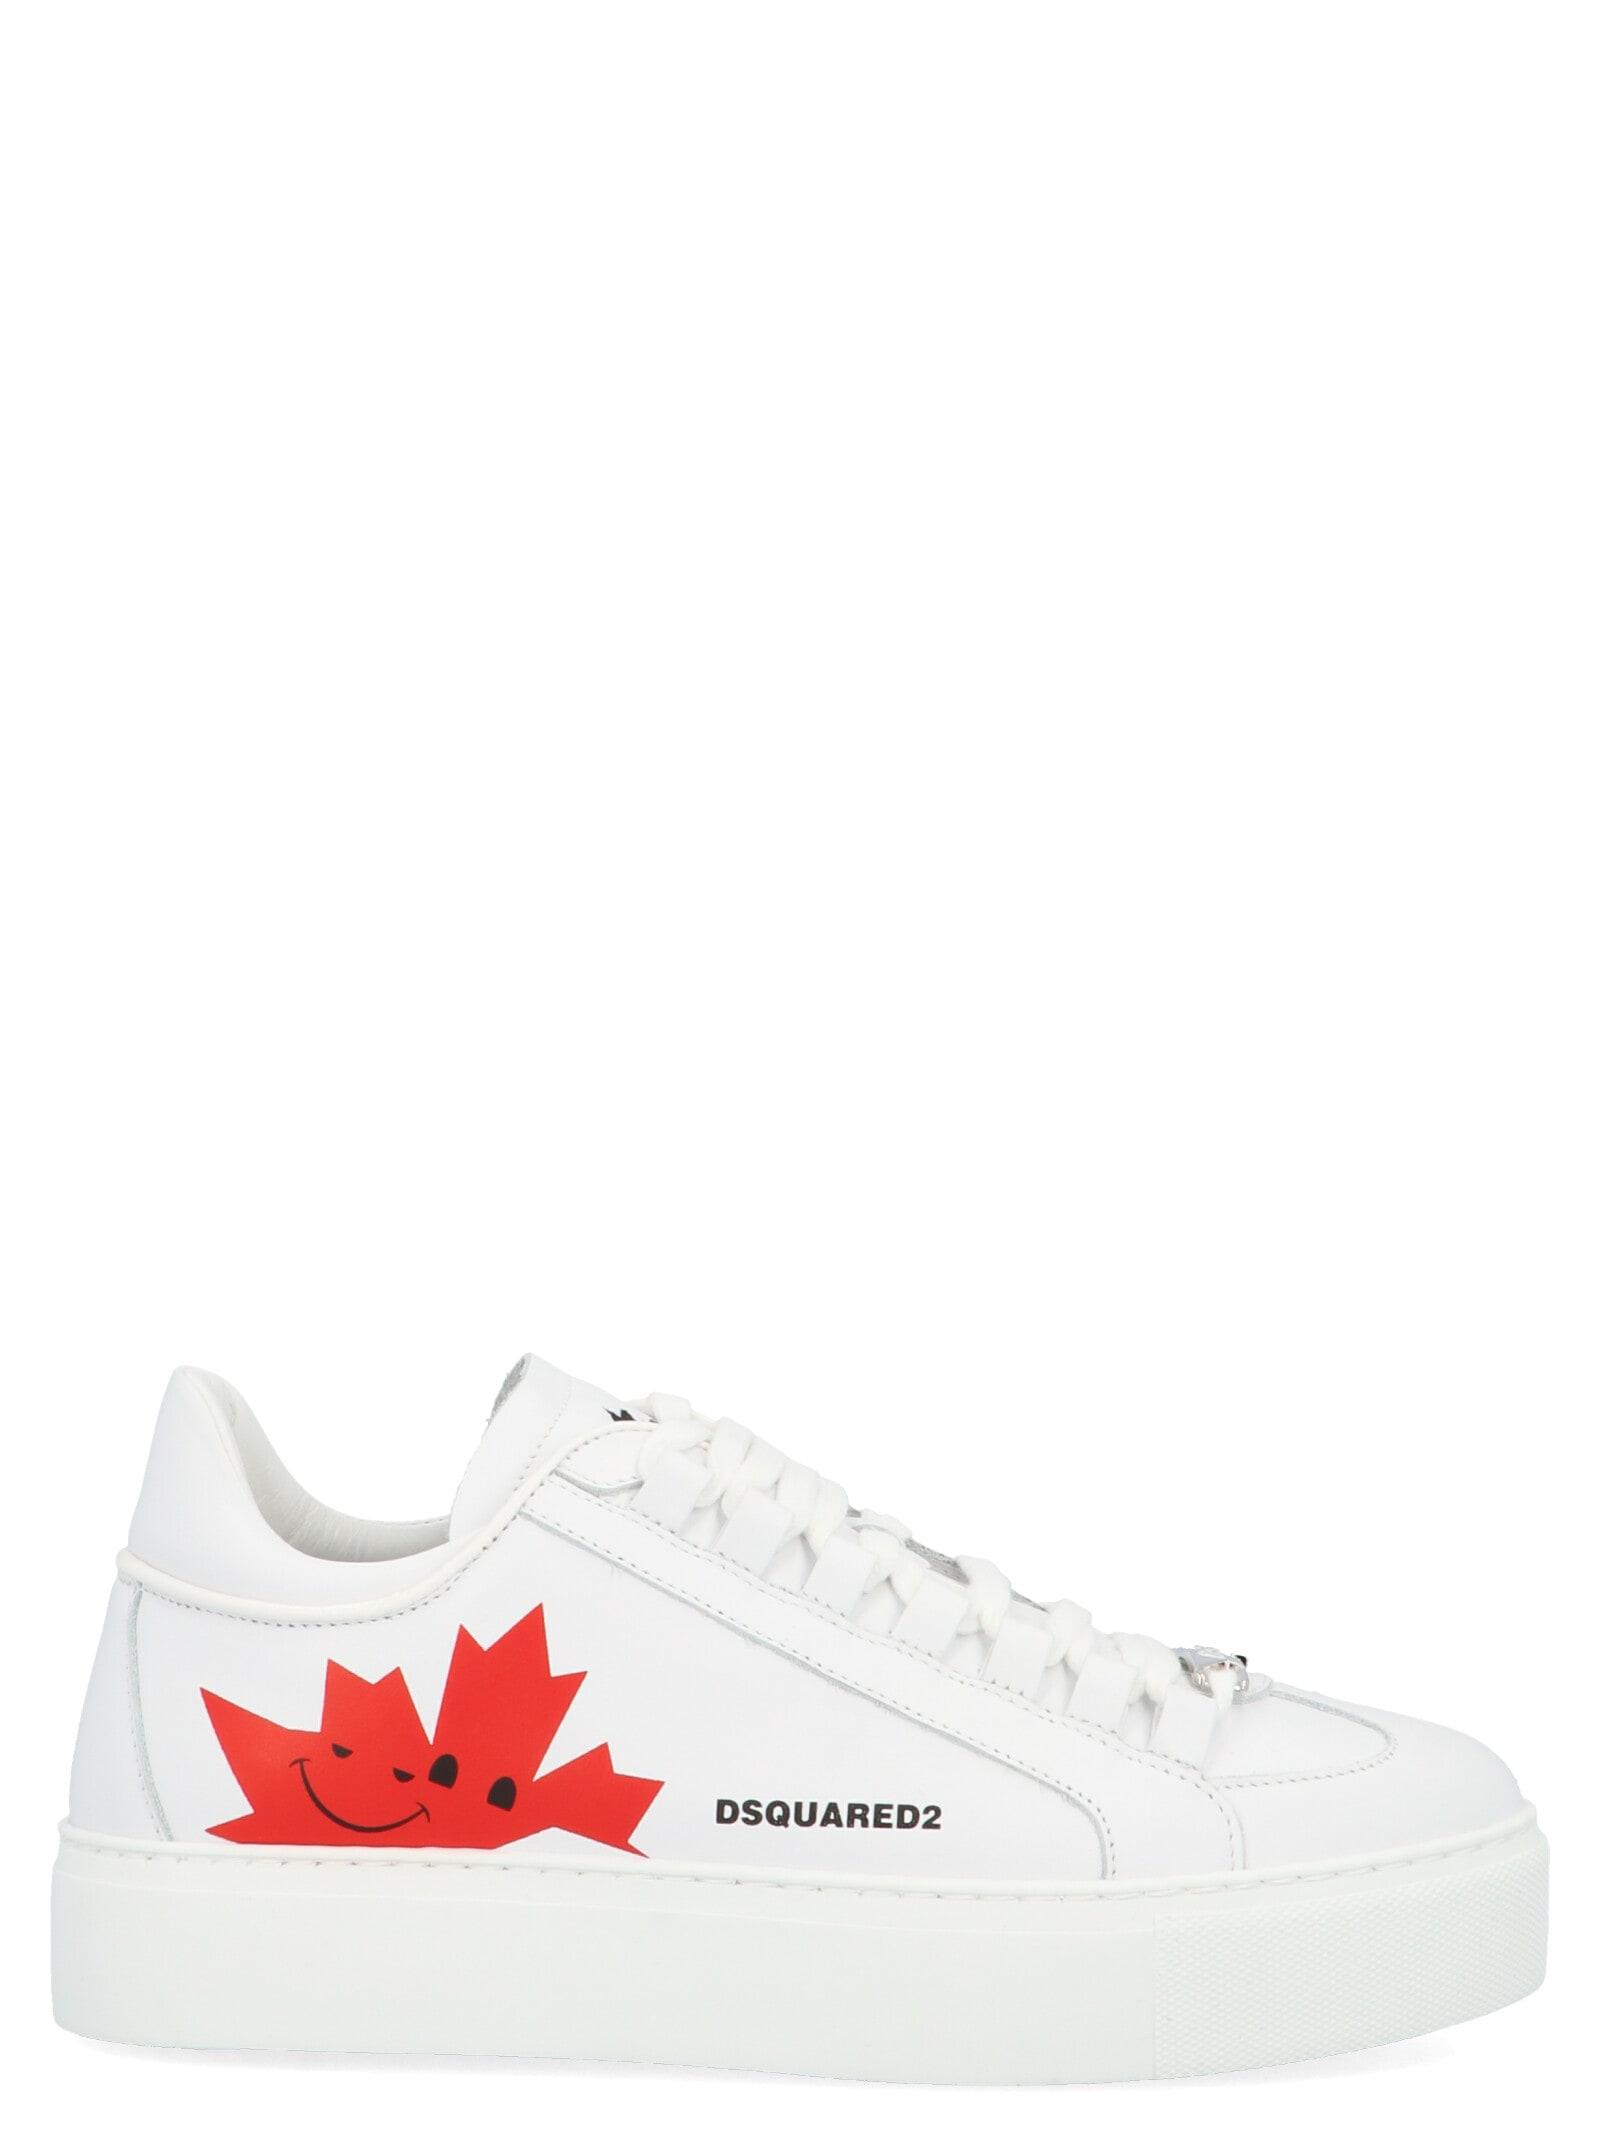 Dsquared2 Dsquared2 'canadian Team